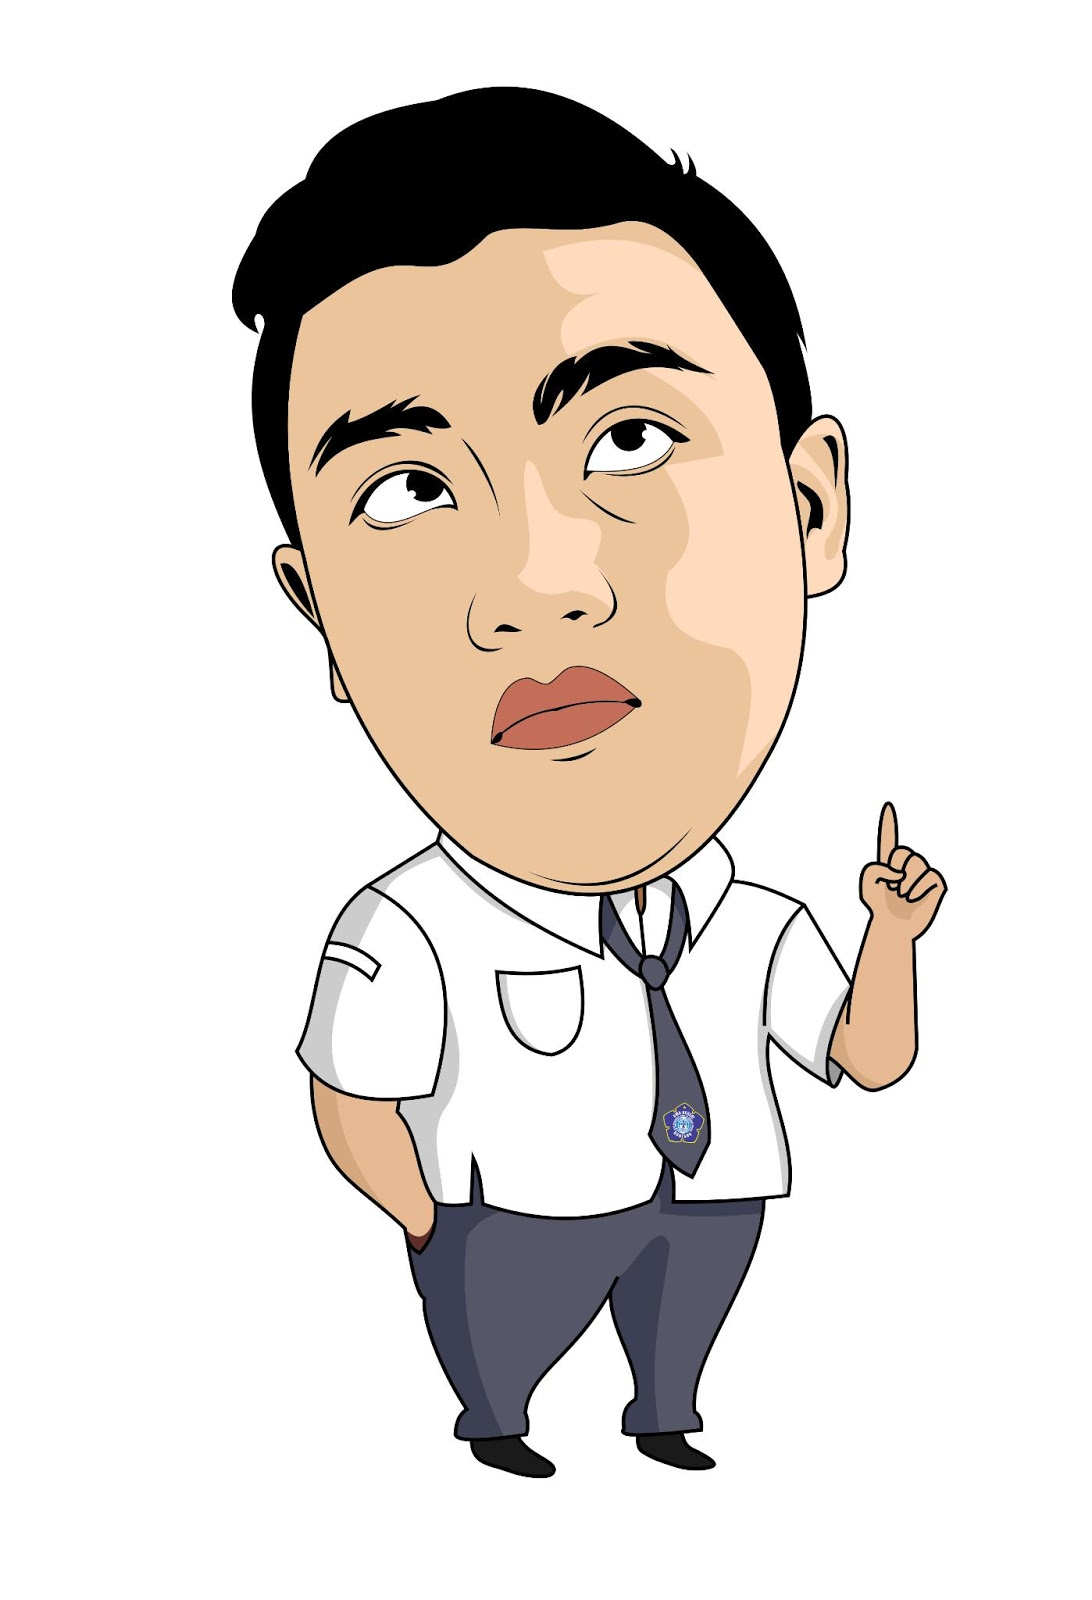 Ide Remaja: Karikatur SMA Cowok